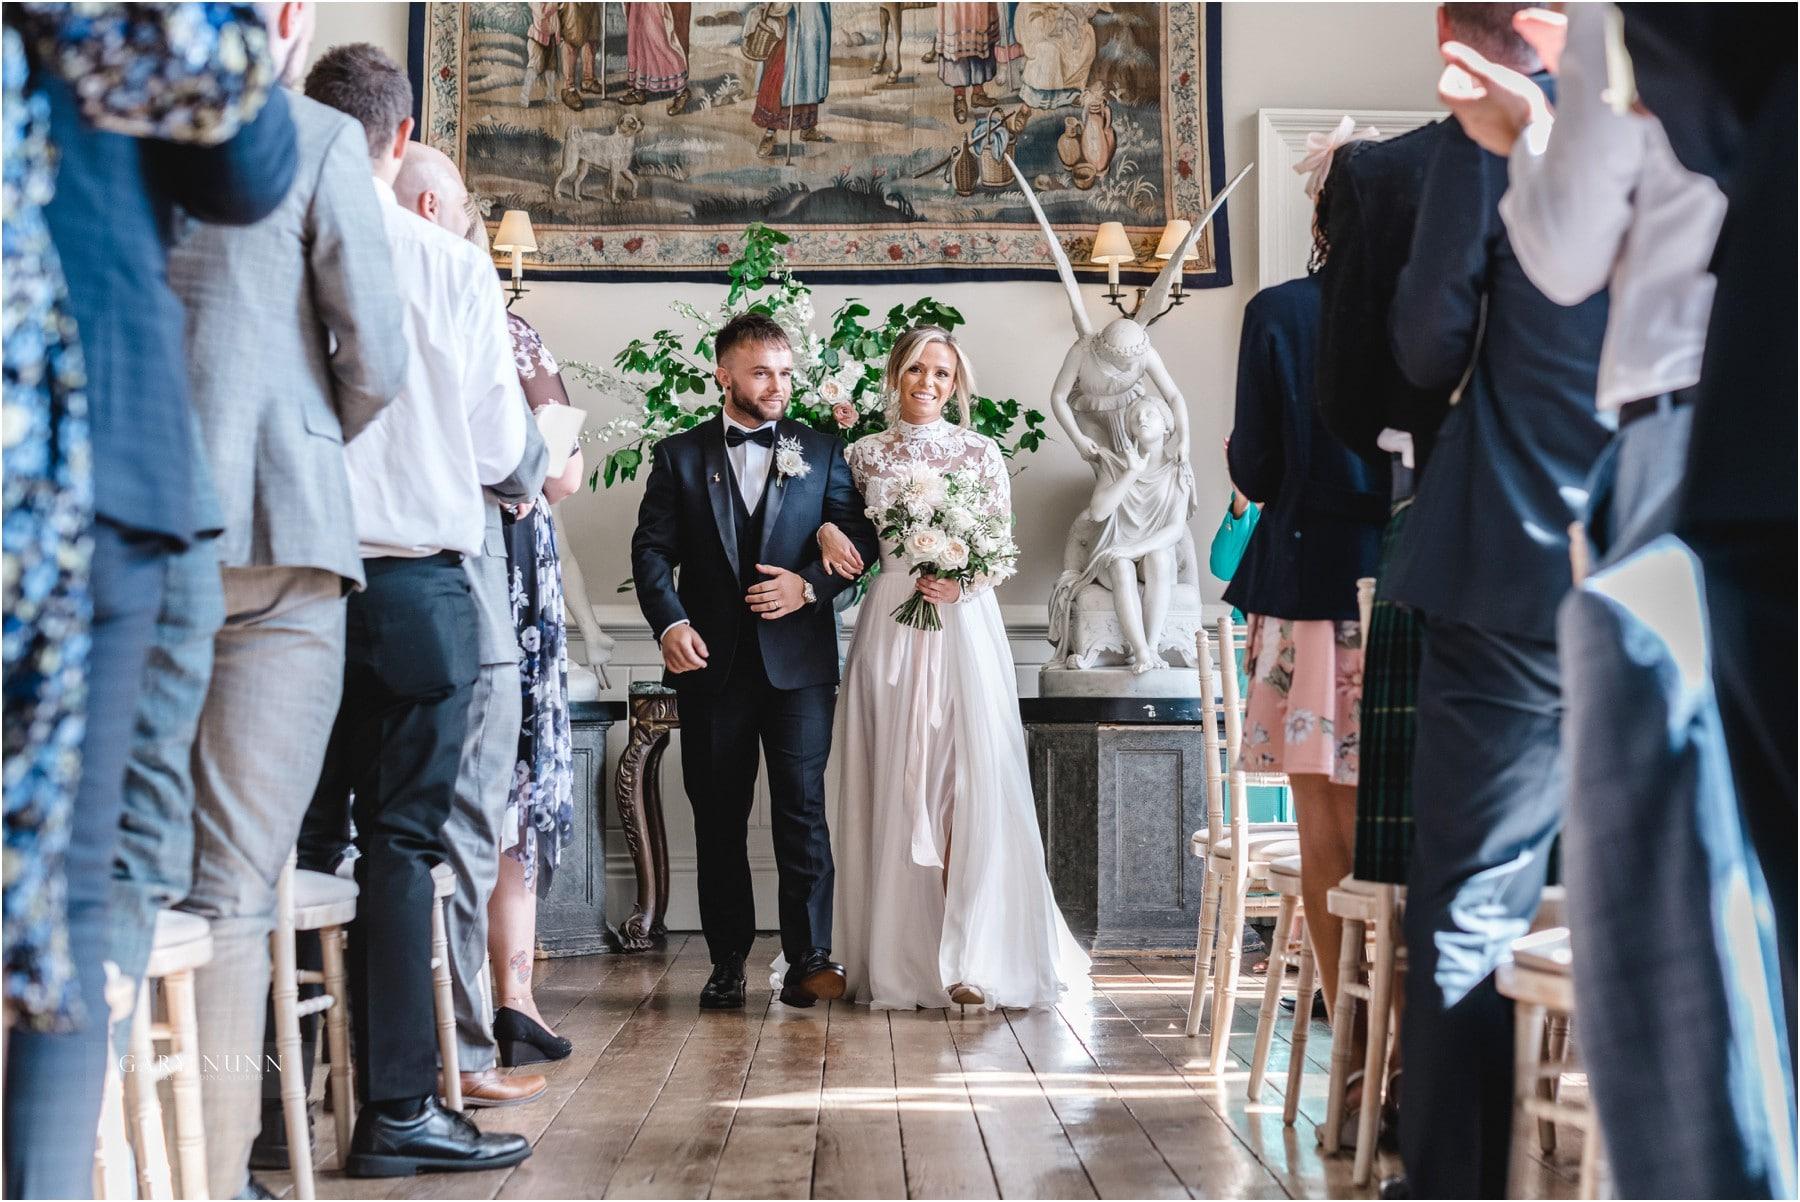 Elmore Court Weddings, Elmore court